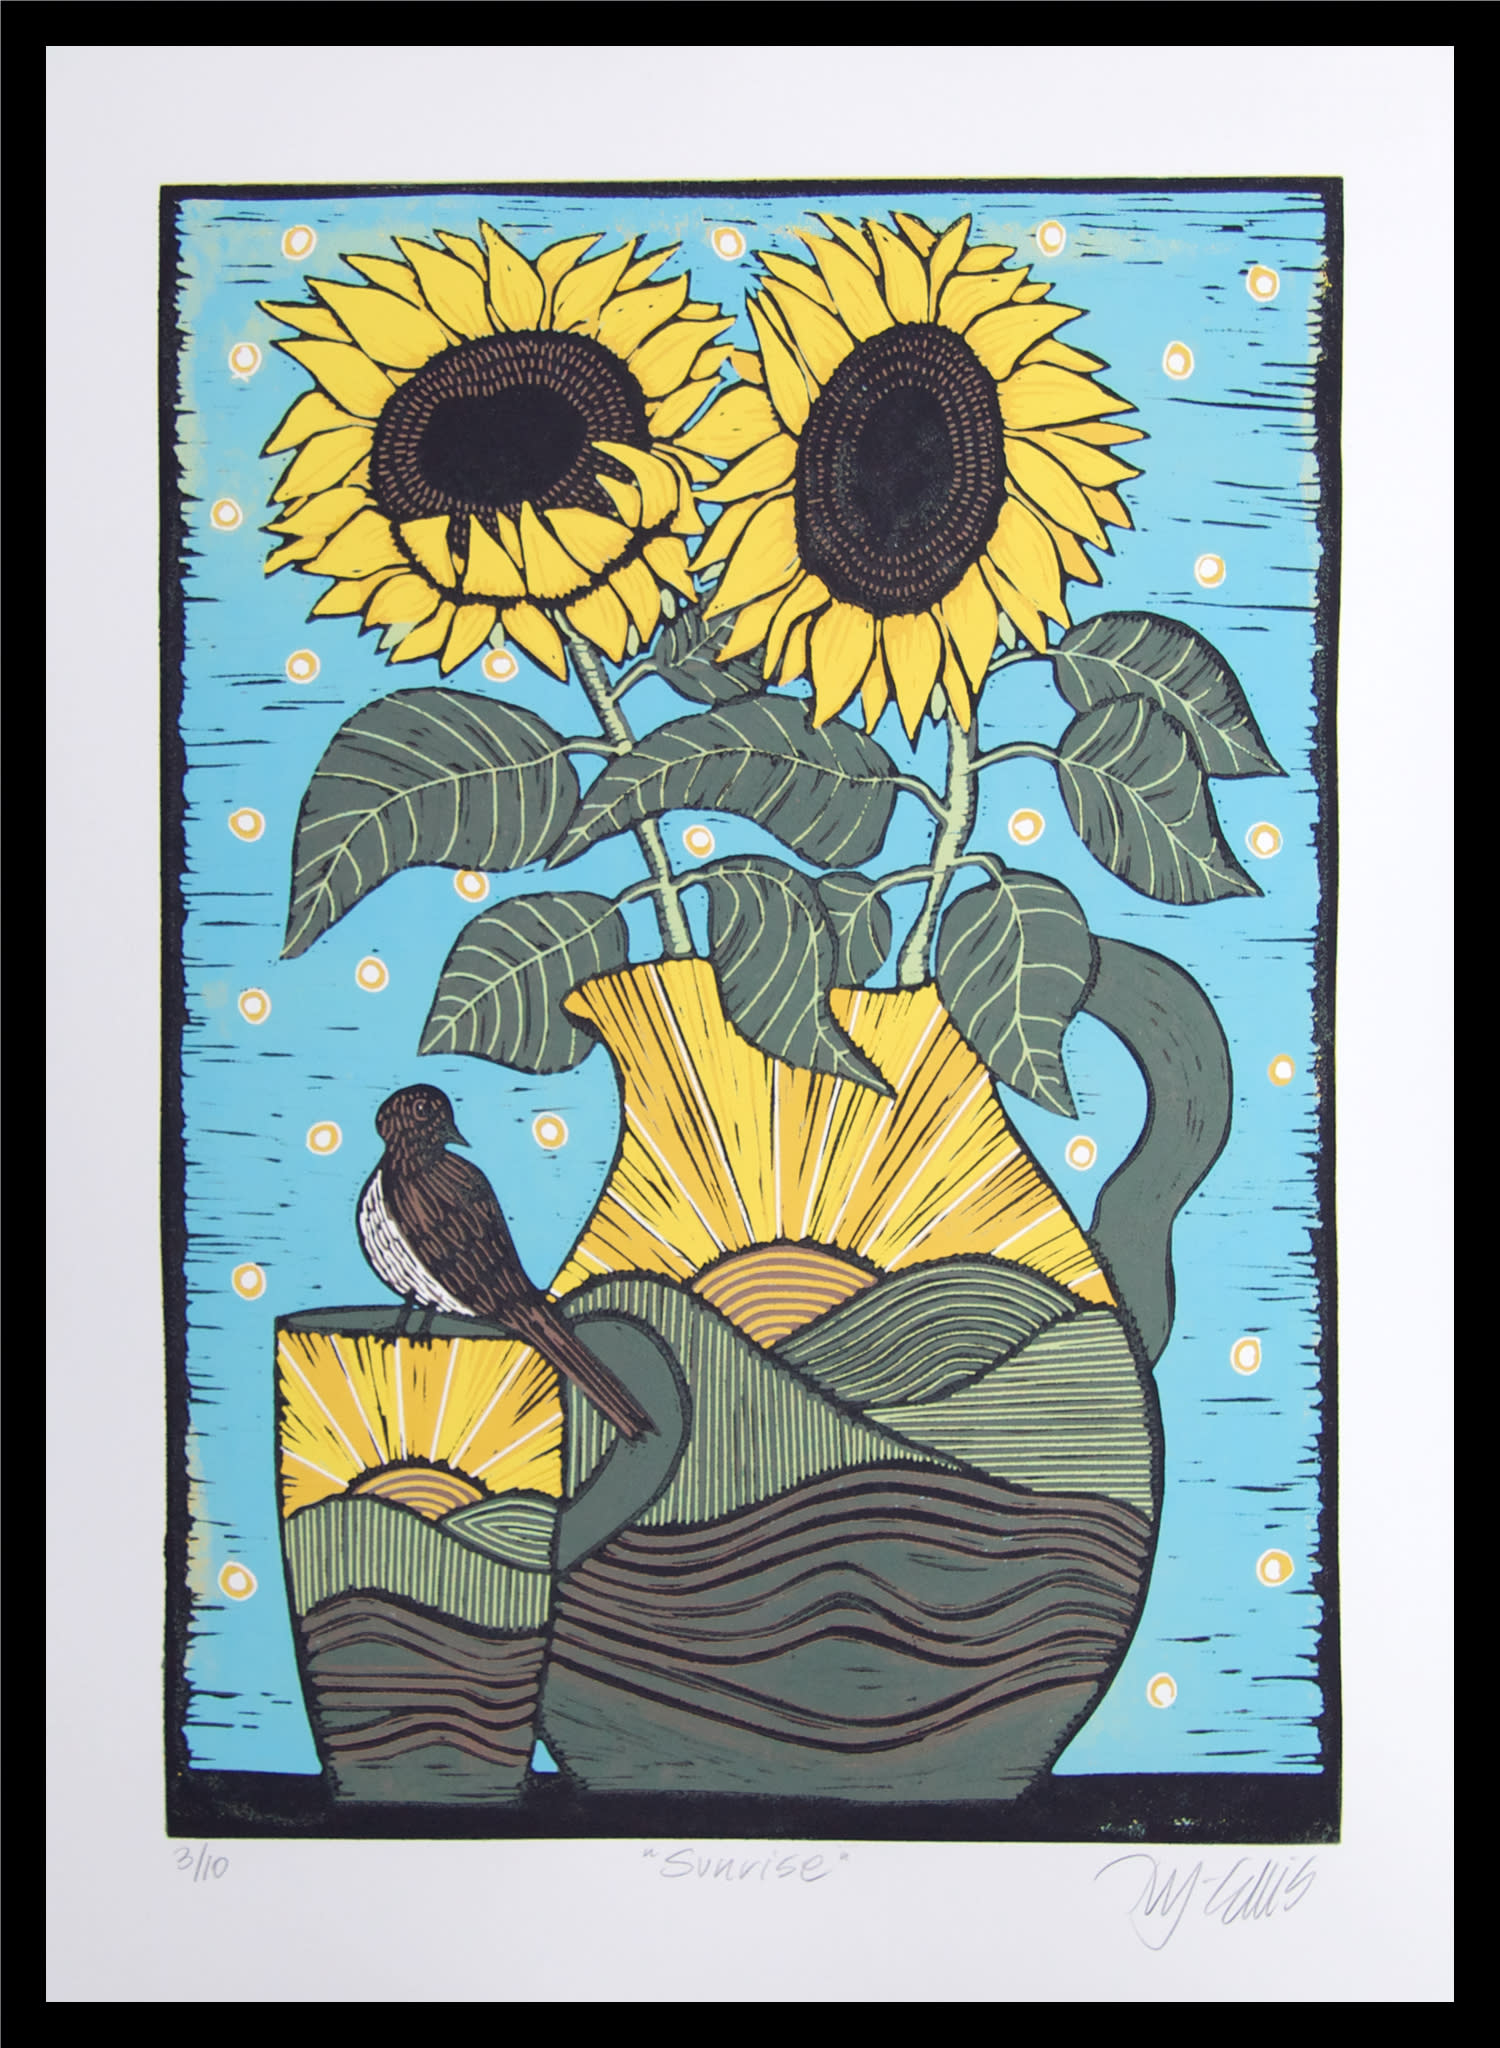 Sunflowers framed nz39pk